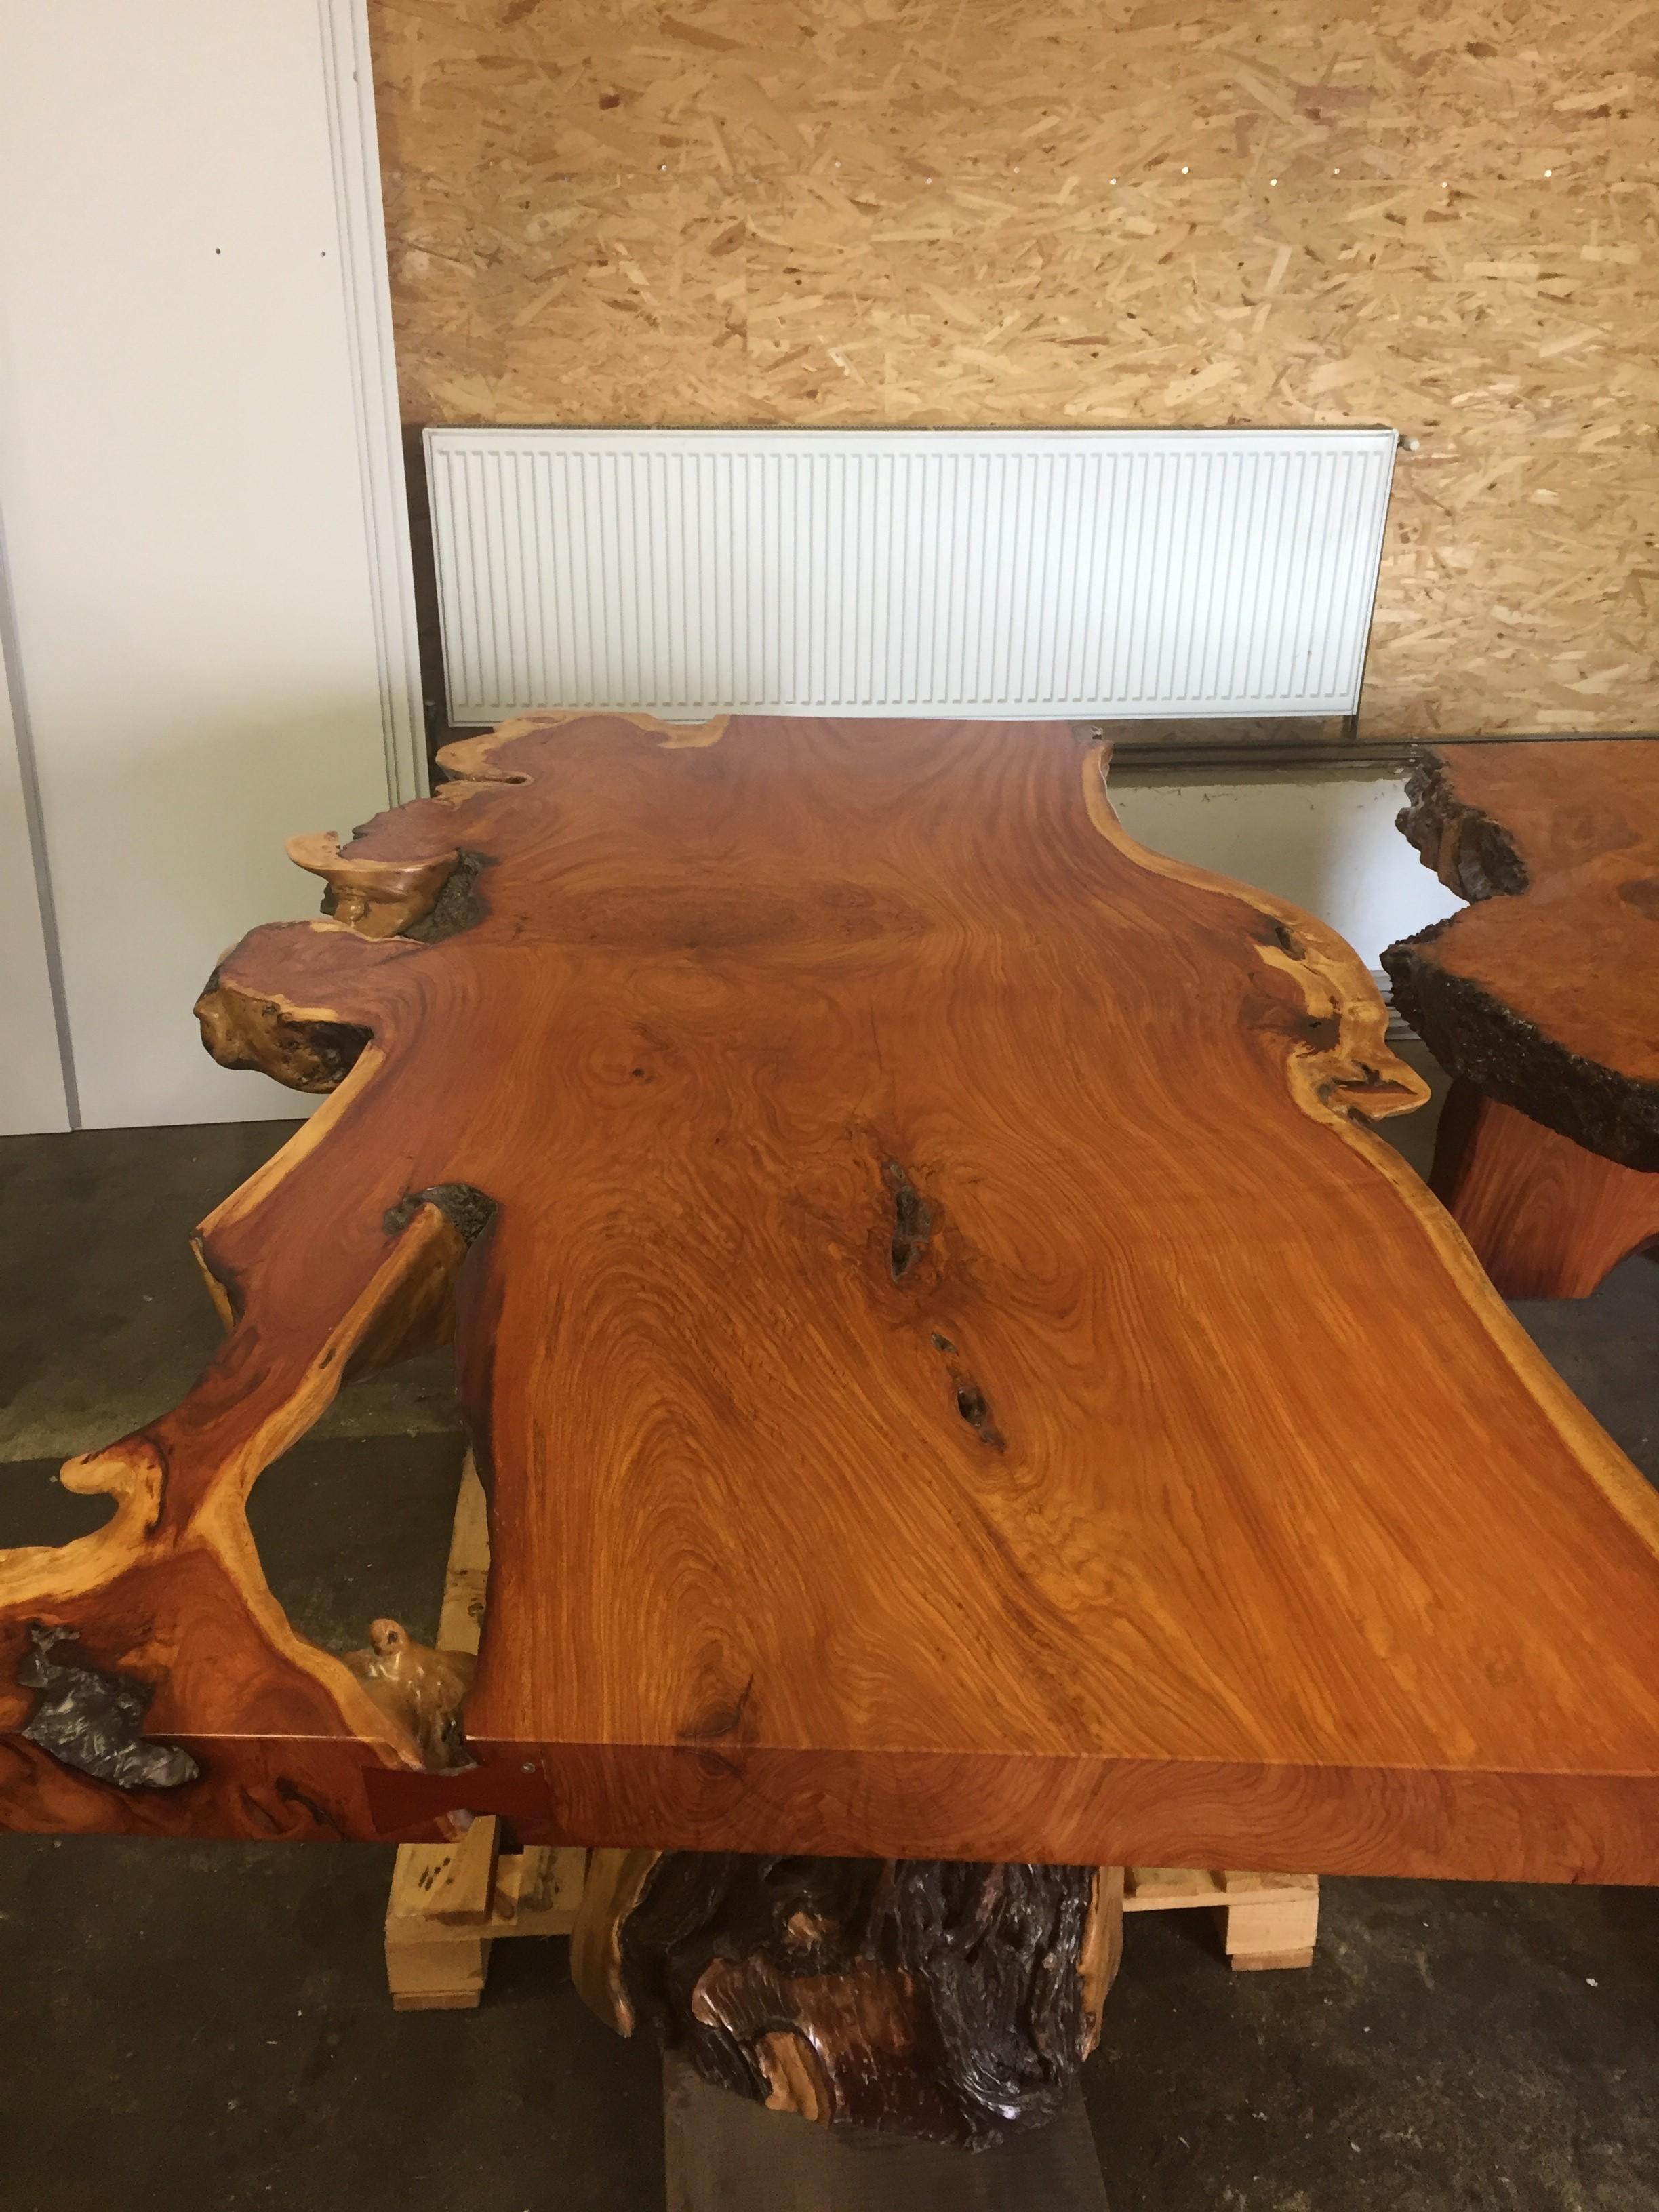 34007bb382d3f Masívny jedálenský stôl z Thajska dreviny Mahagon | Furniture-nabytok.sk